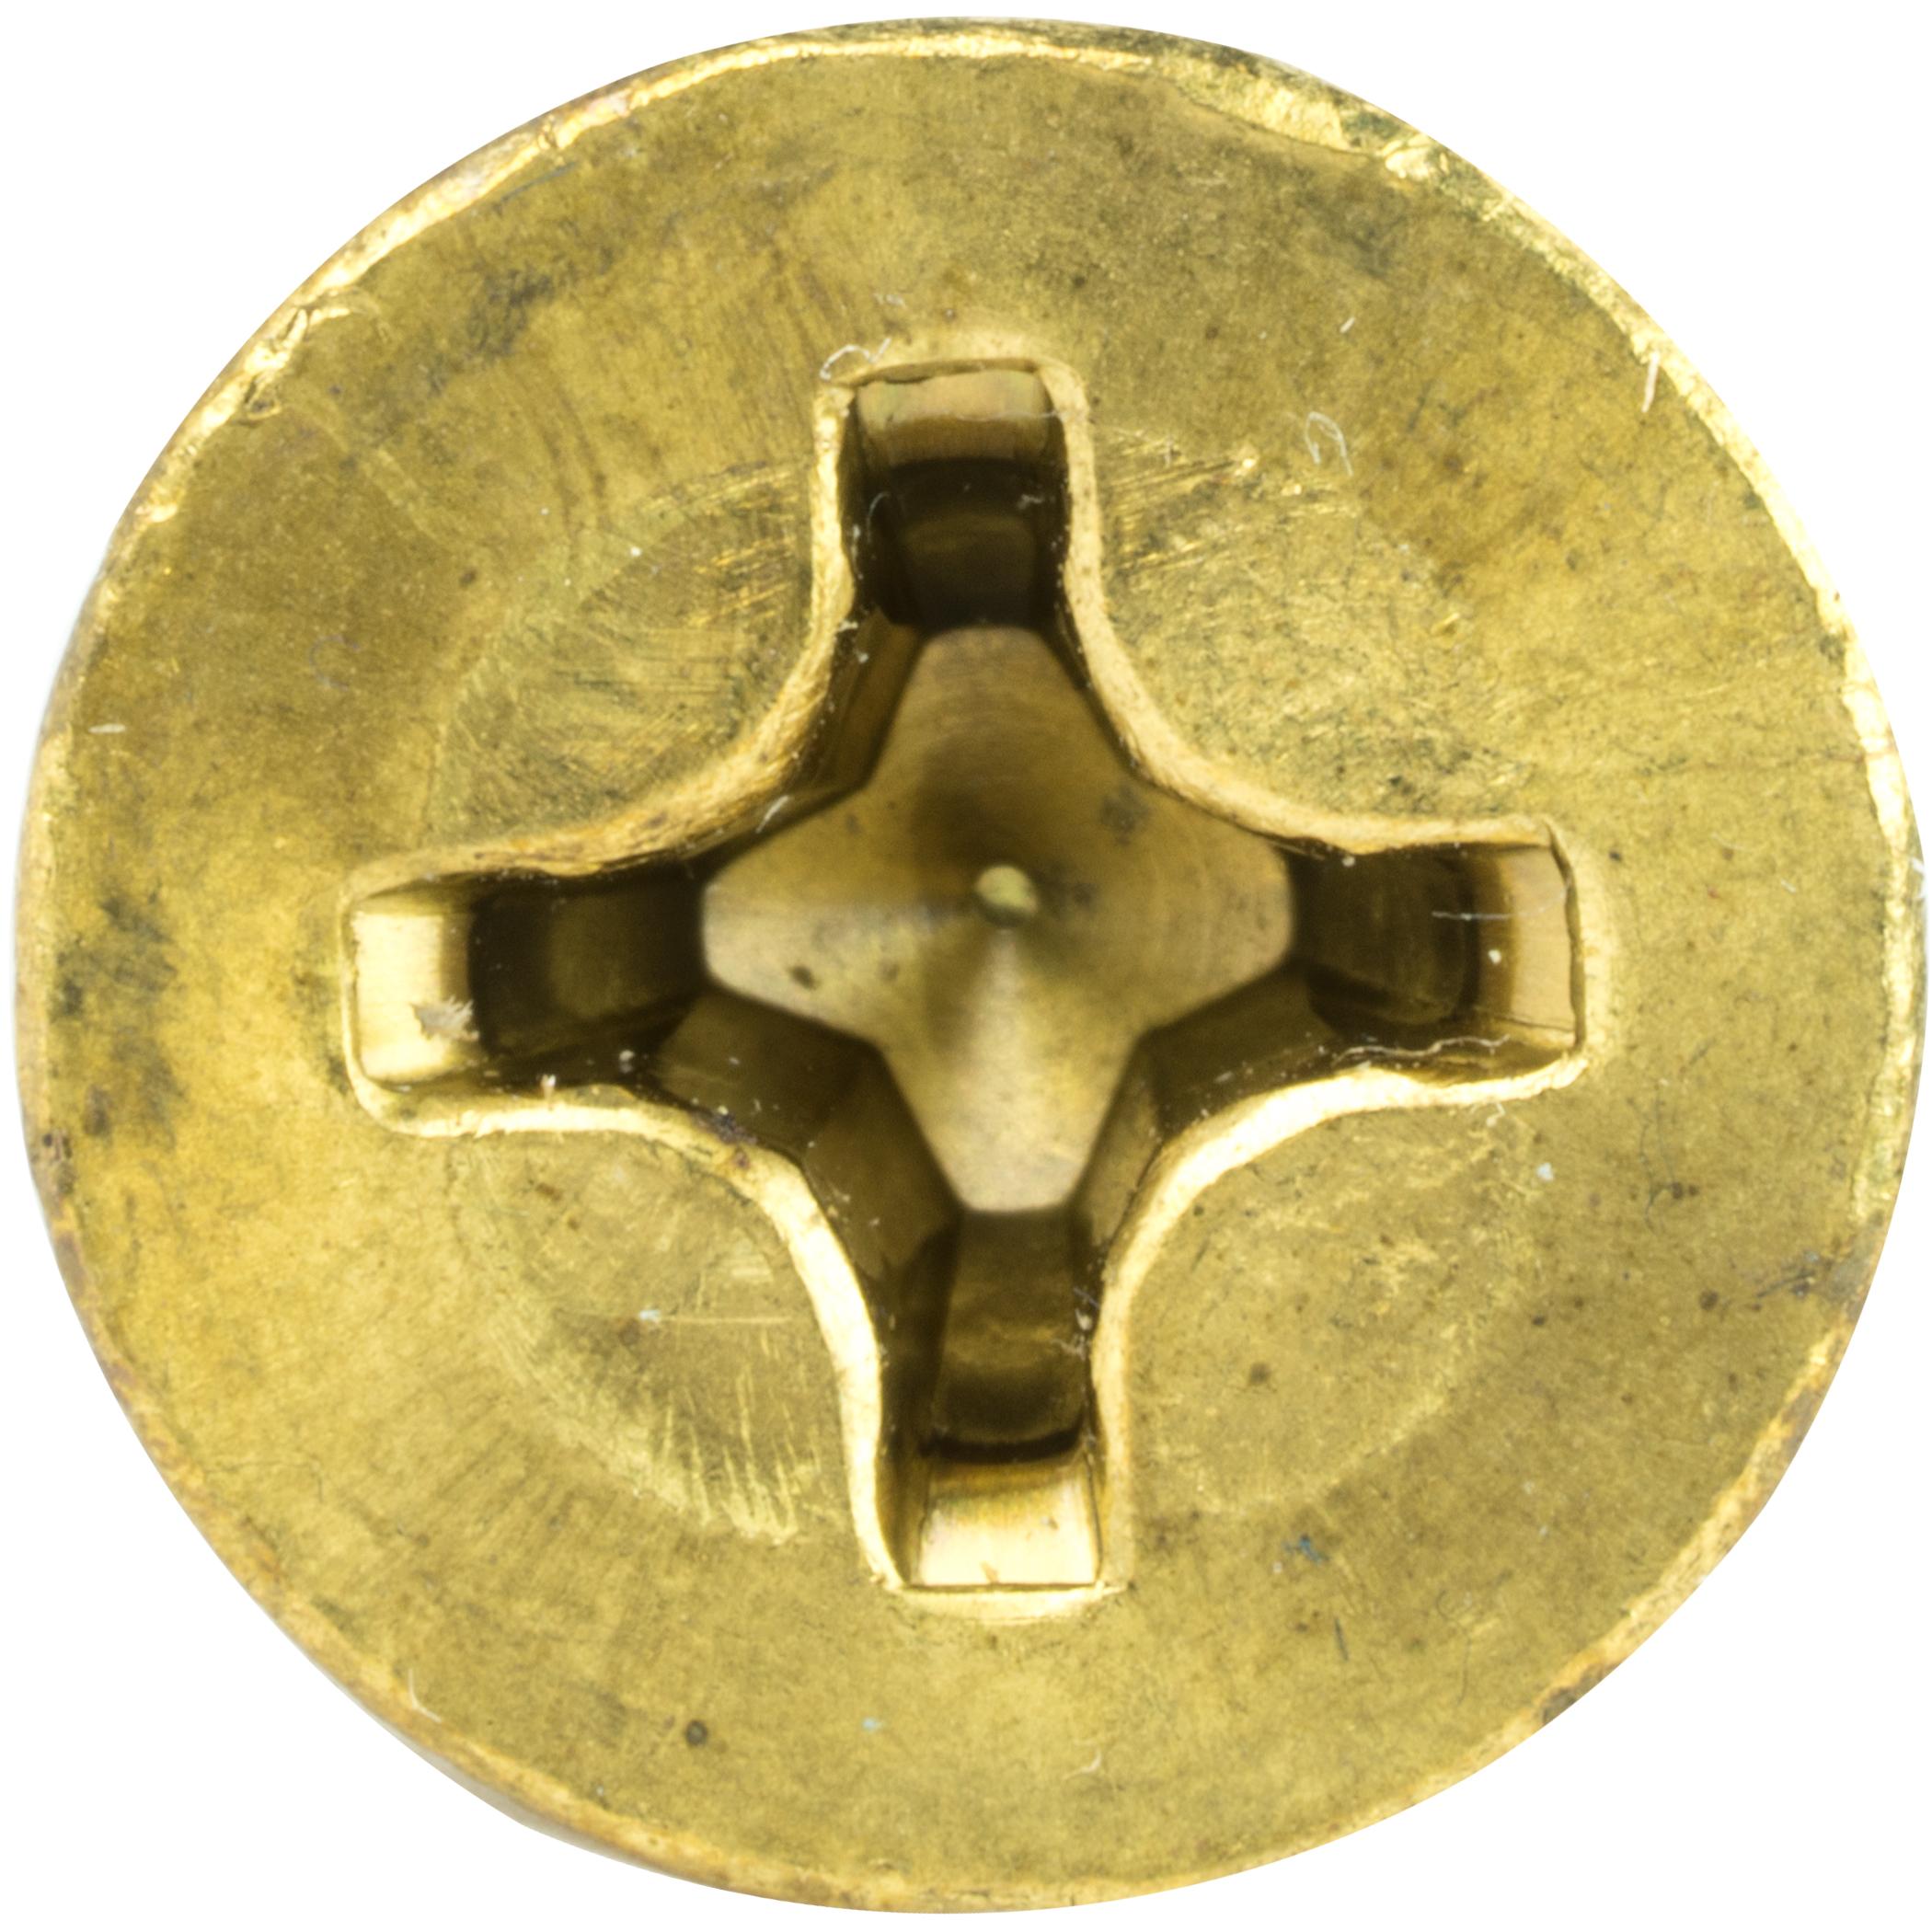 10-24 Flat Head Countersink Machine Screws Solid Brass Phillips Drive All Sizes